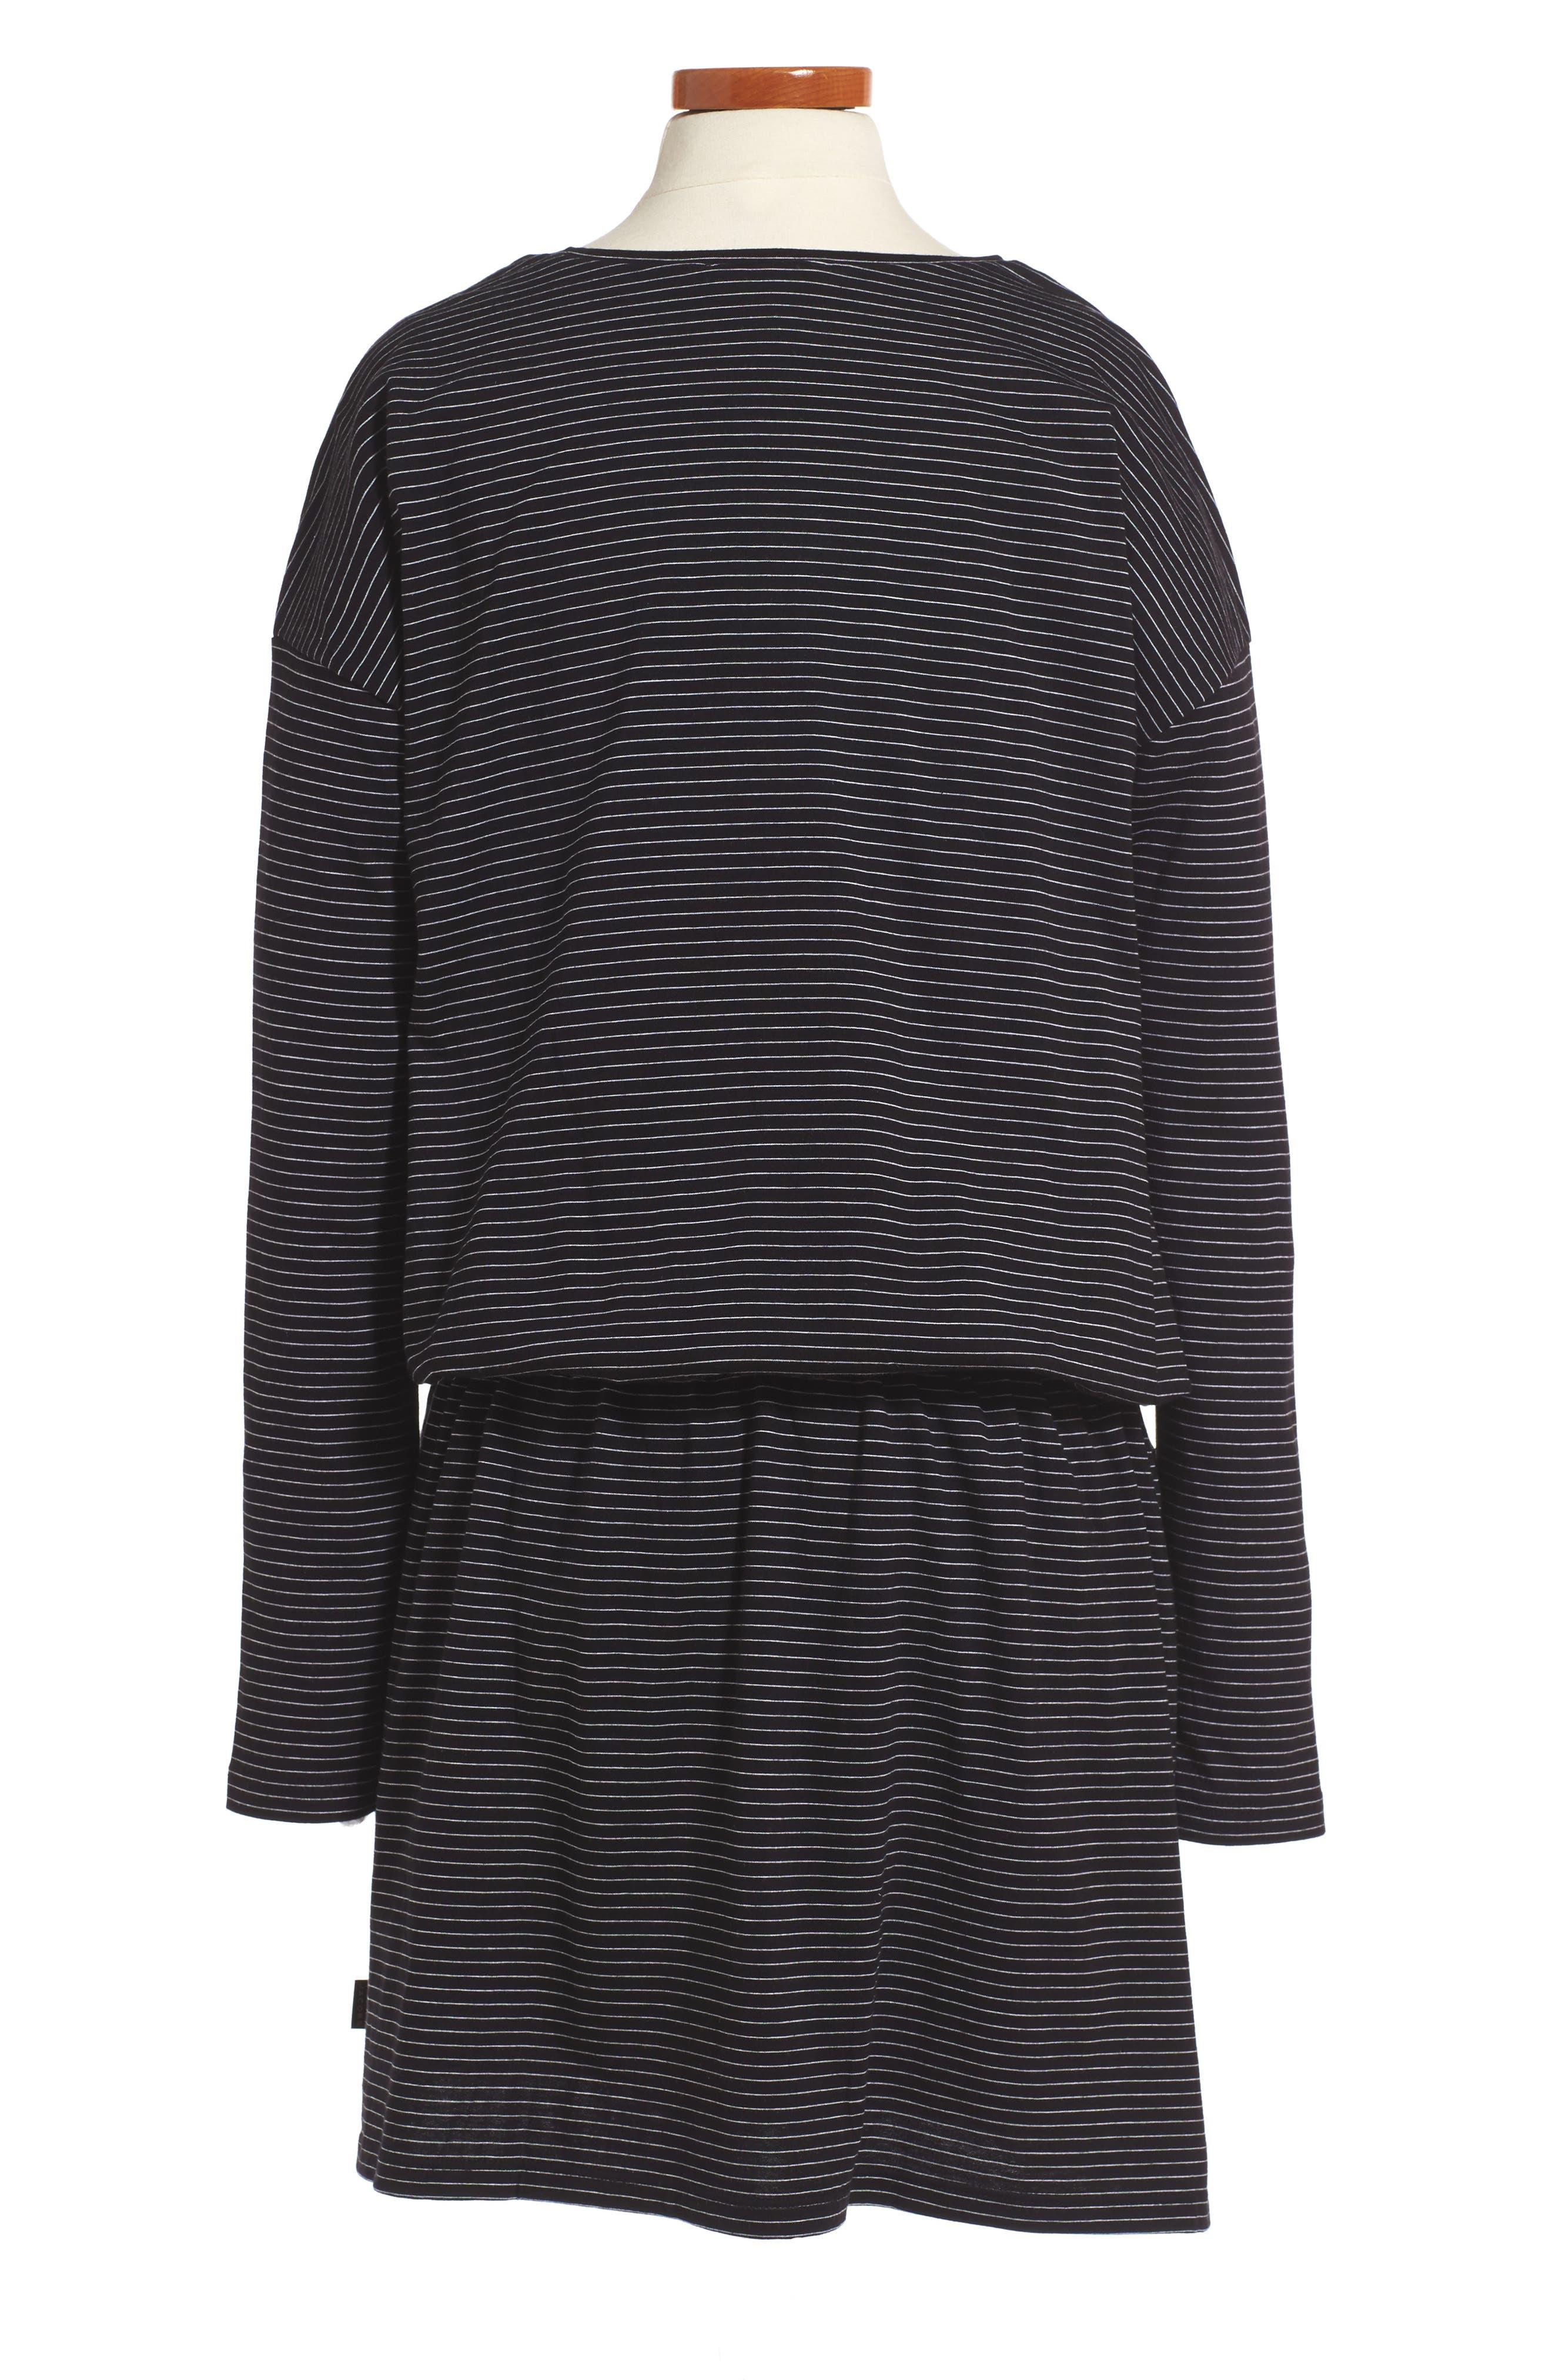 Swan Embroidered Blouson Dress,                             Alternate thumbnail 2, color,                             Black